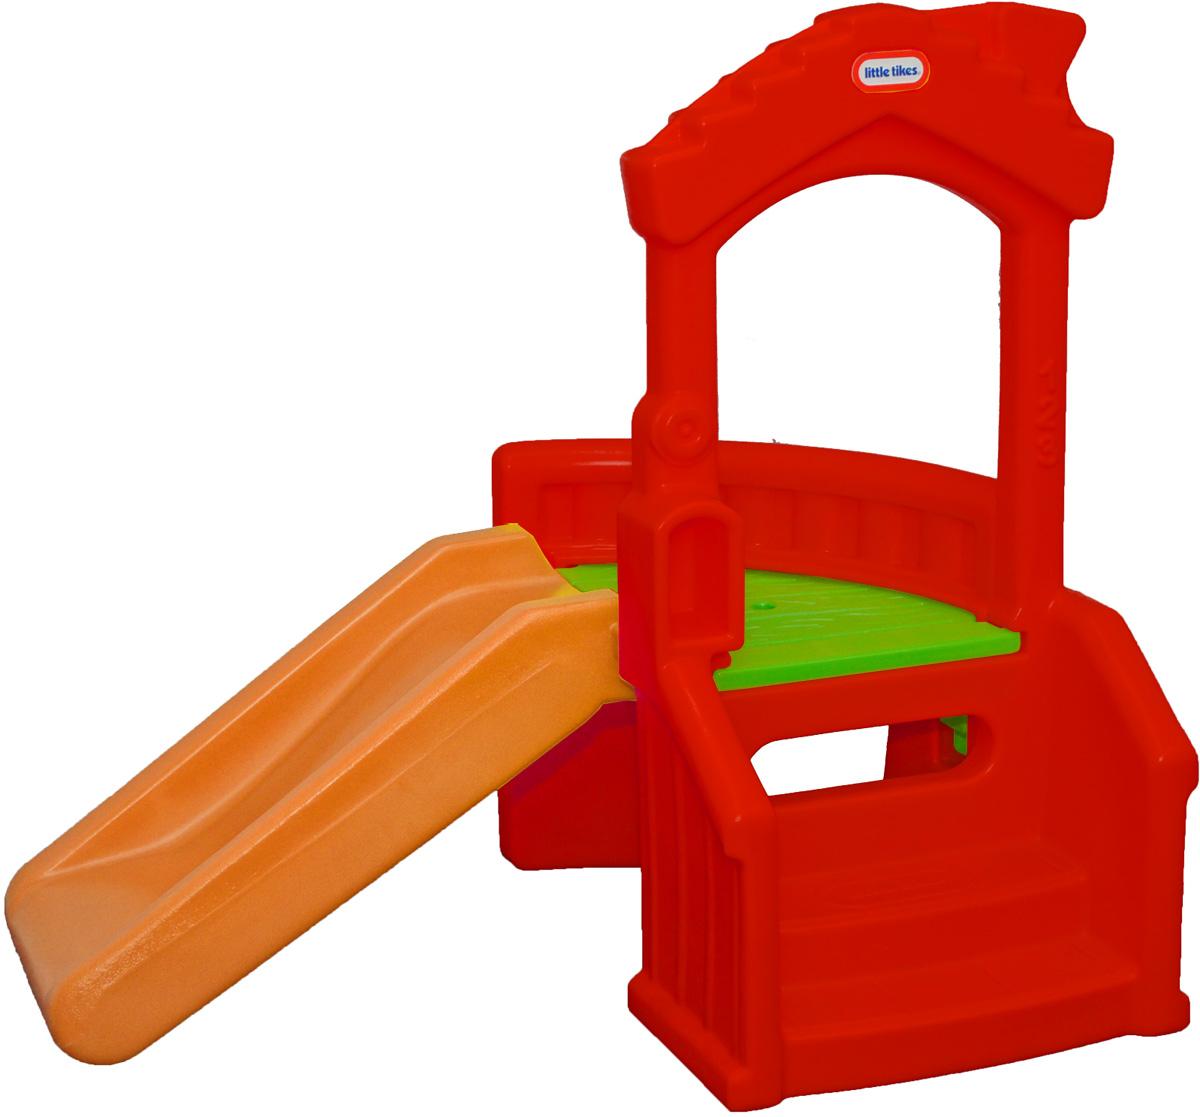 Little Tikes Игровой комплекс Climb & Slide Playhouse little tikes матрас для пеленания little tikes